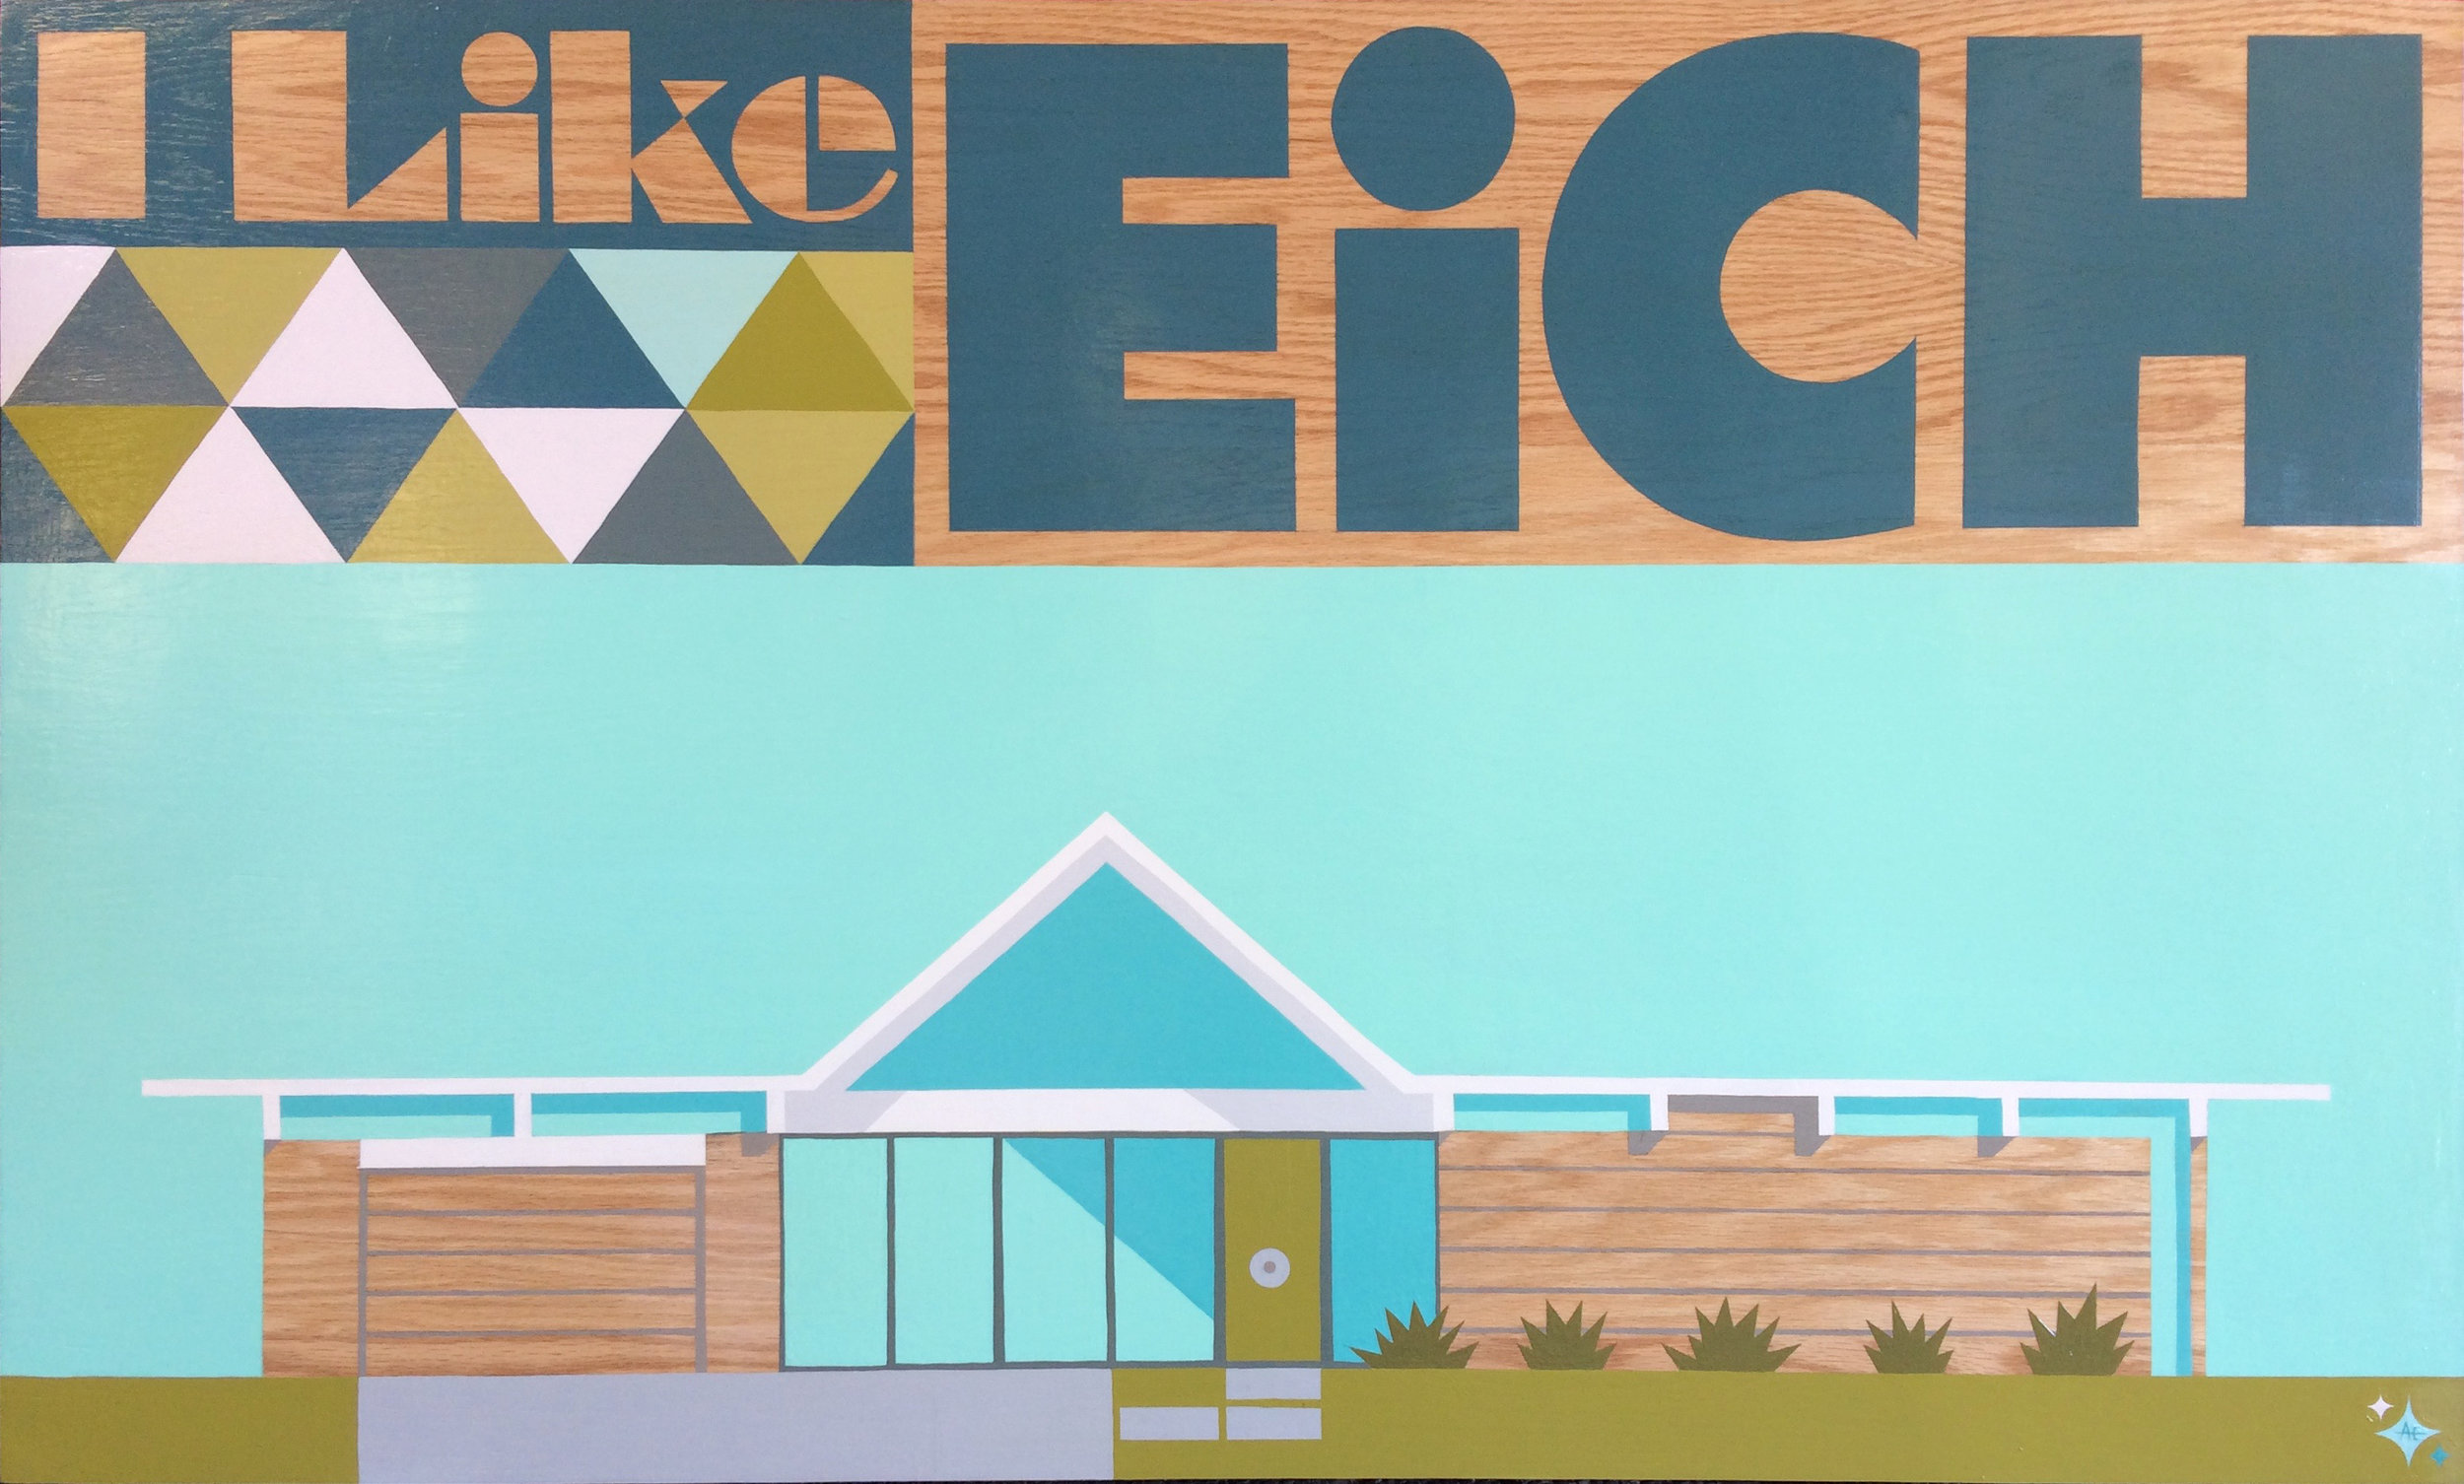 I Like Eich #8